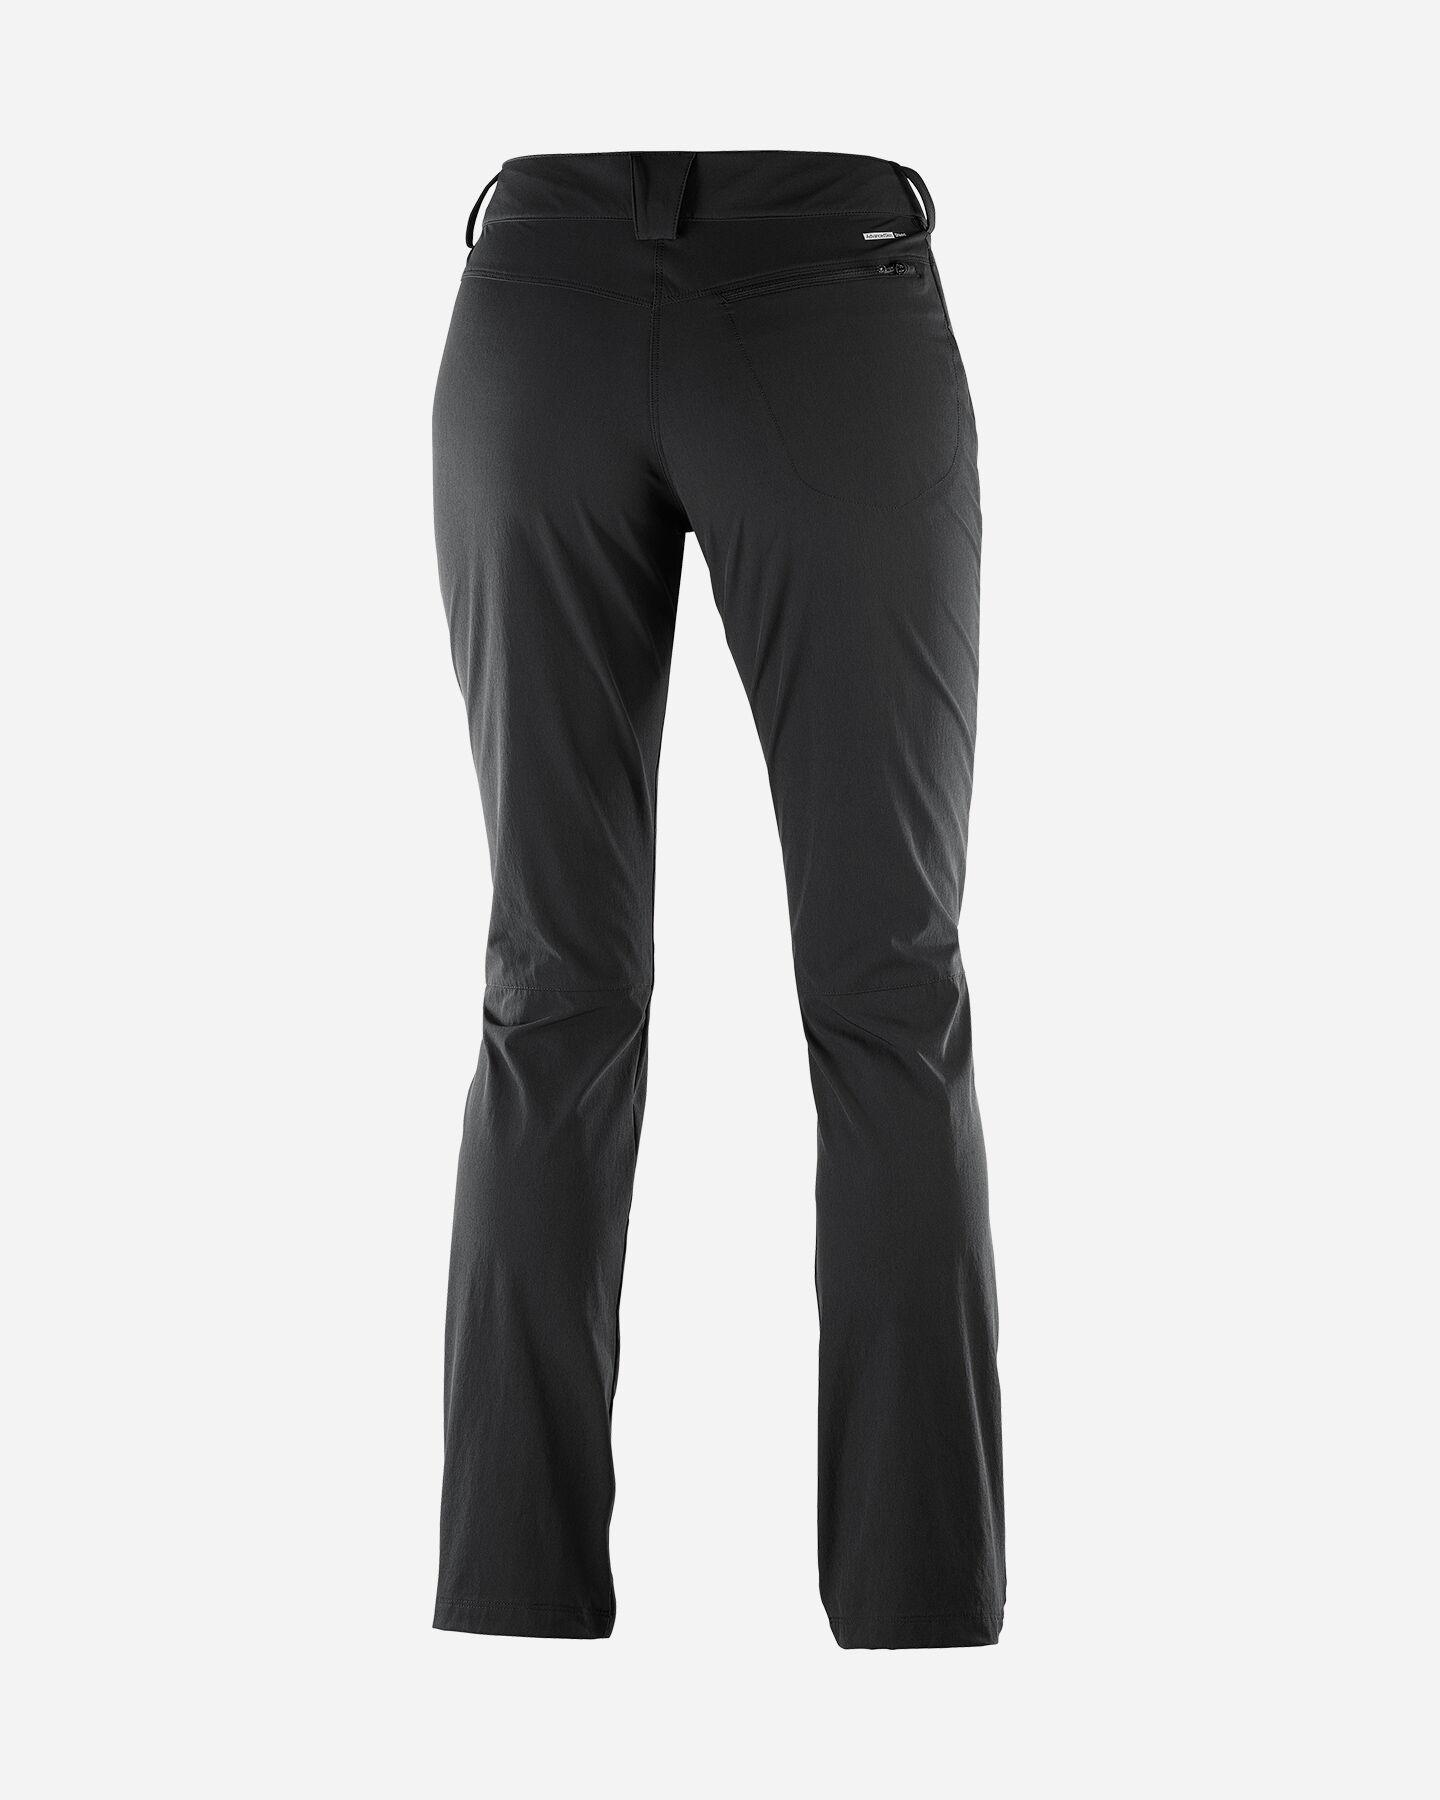 Pantalone outdoor SALOMON WAYFARER STRAIGHT  W S5047681 scatto 2